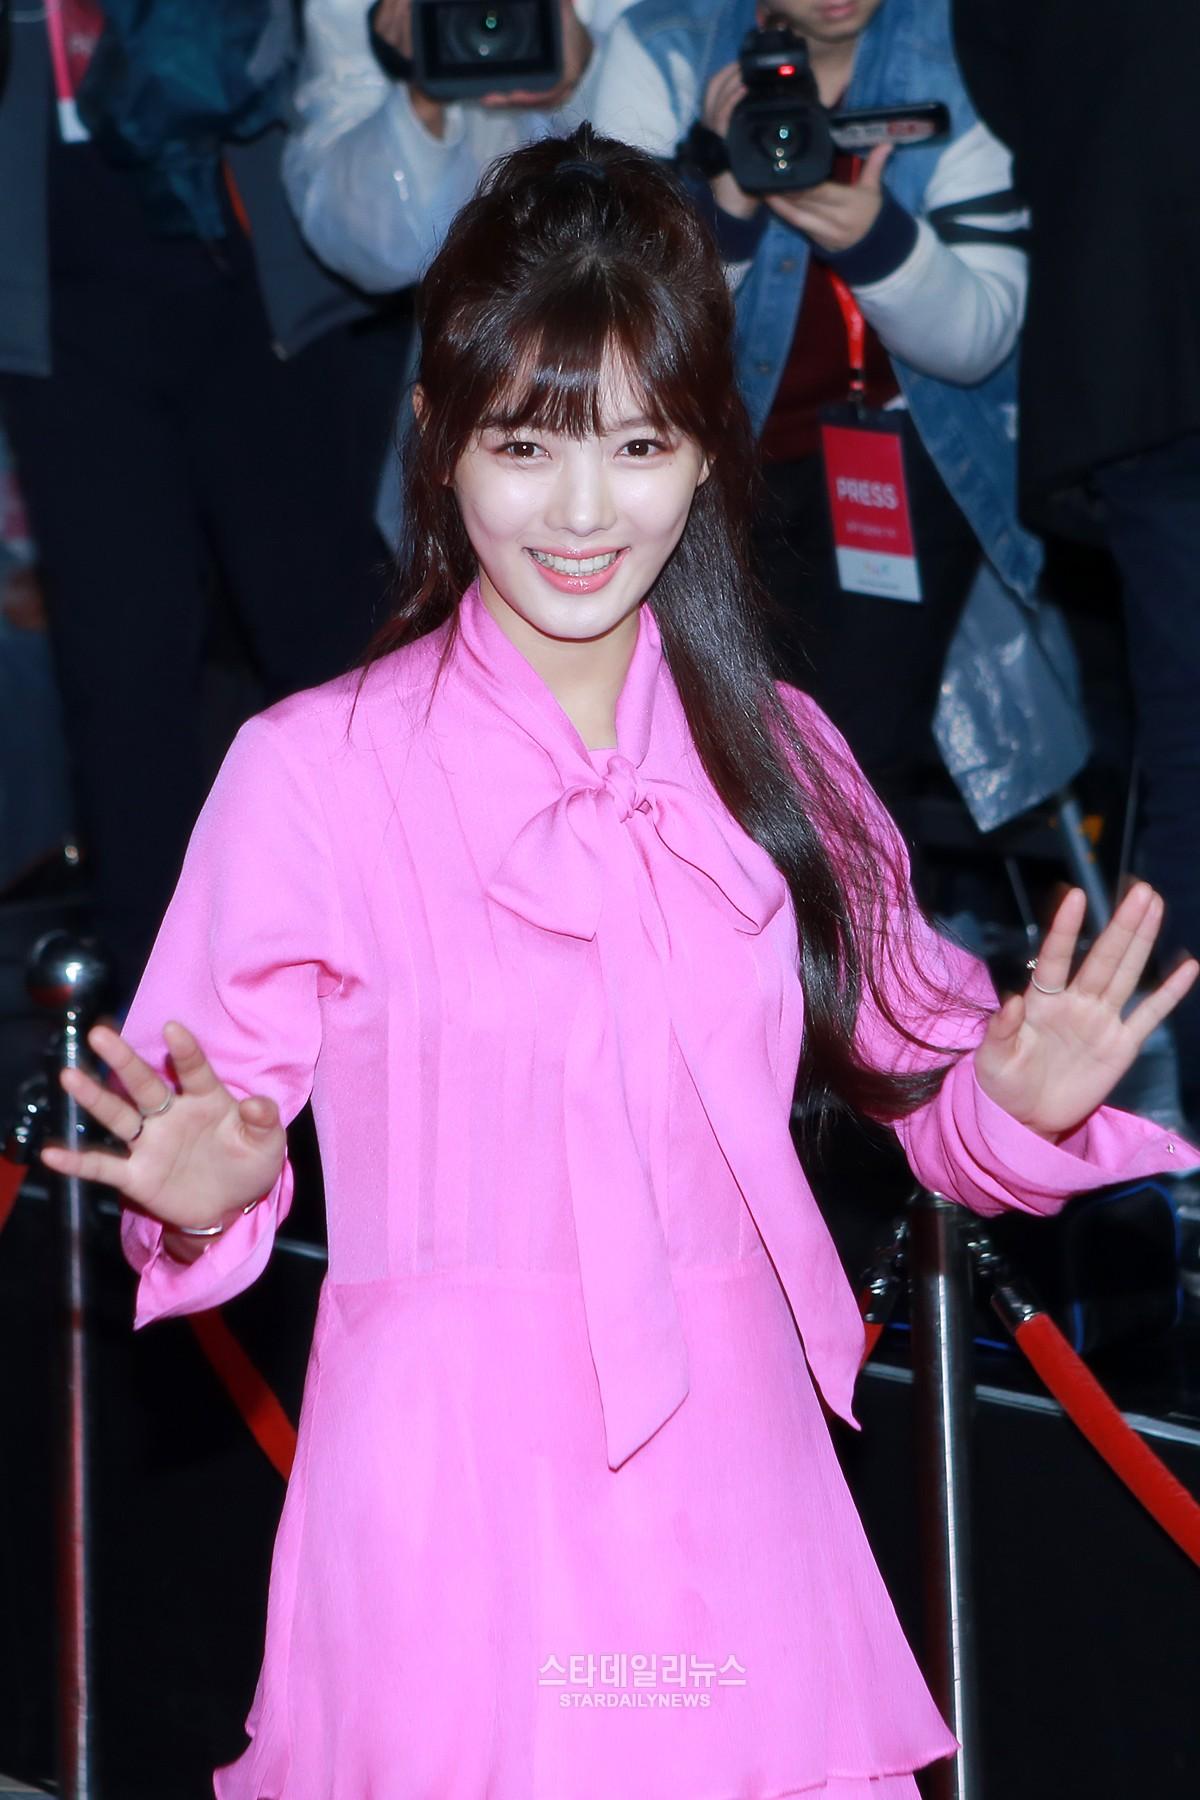 Melon Star Daily News Kim Yoo Jung